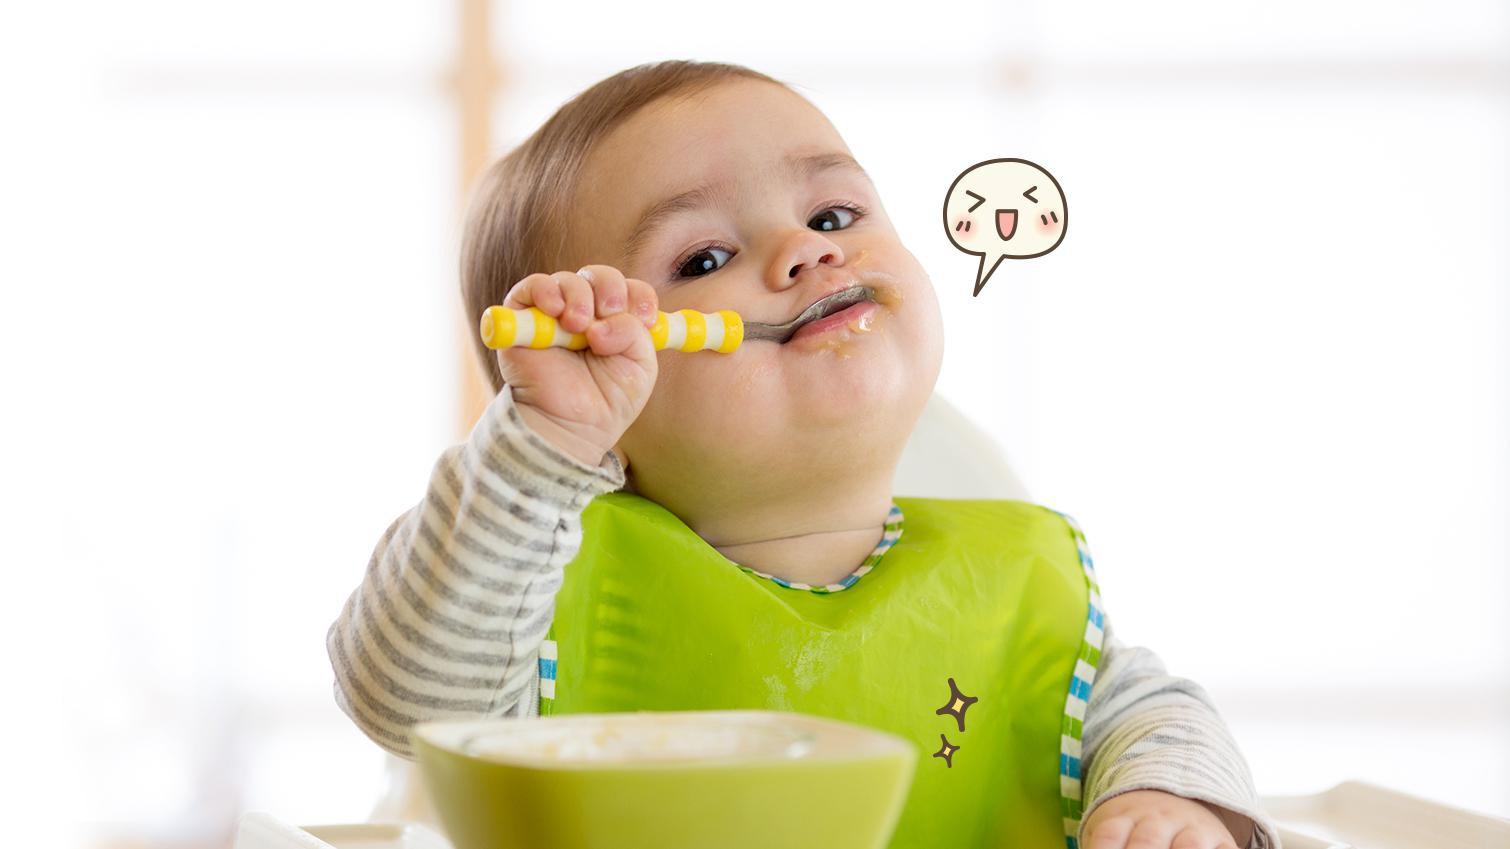 Manfaat Minyak Kelapa untuk MPASI Bayi